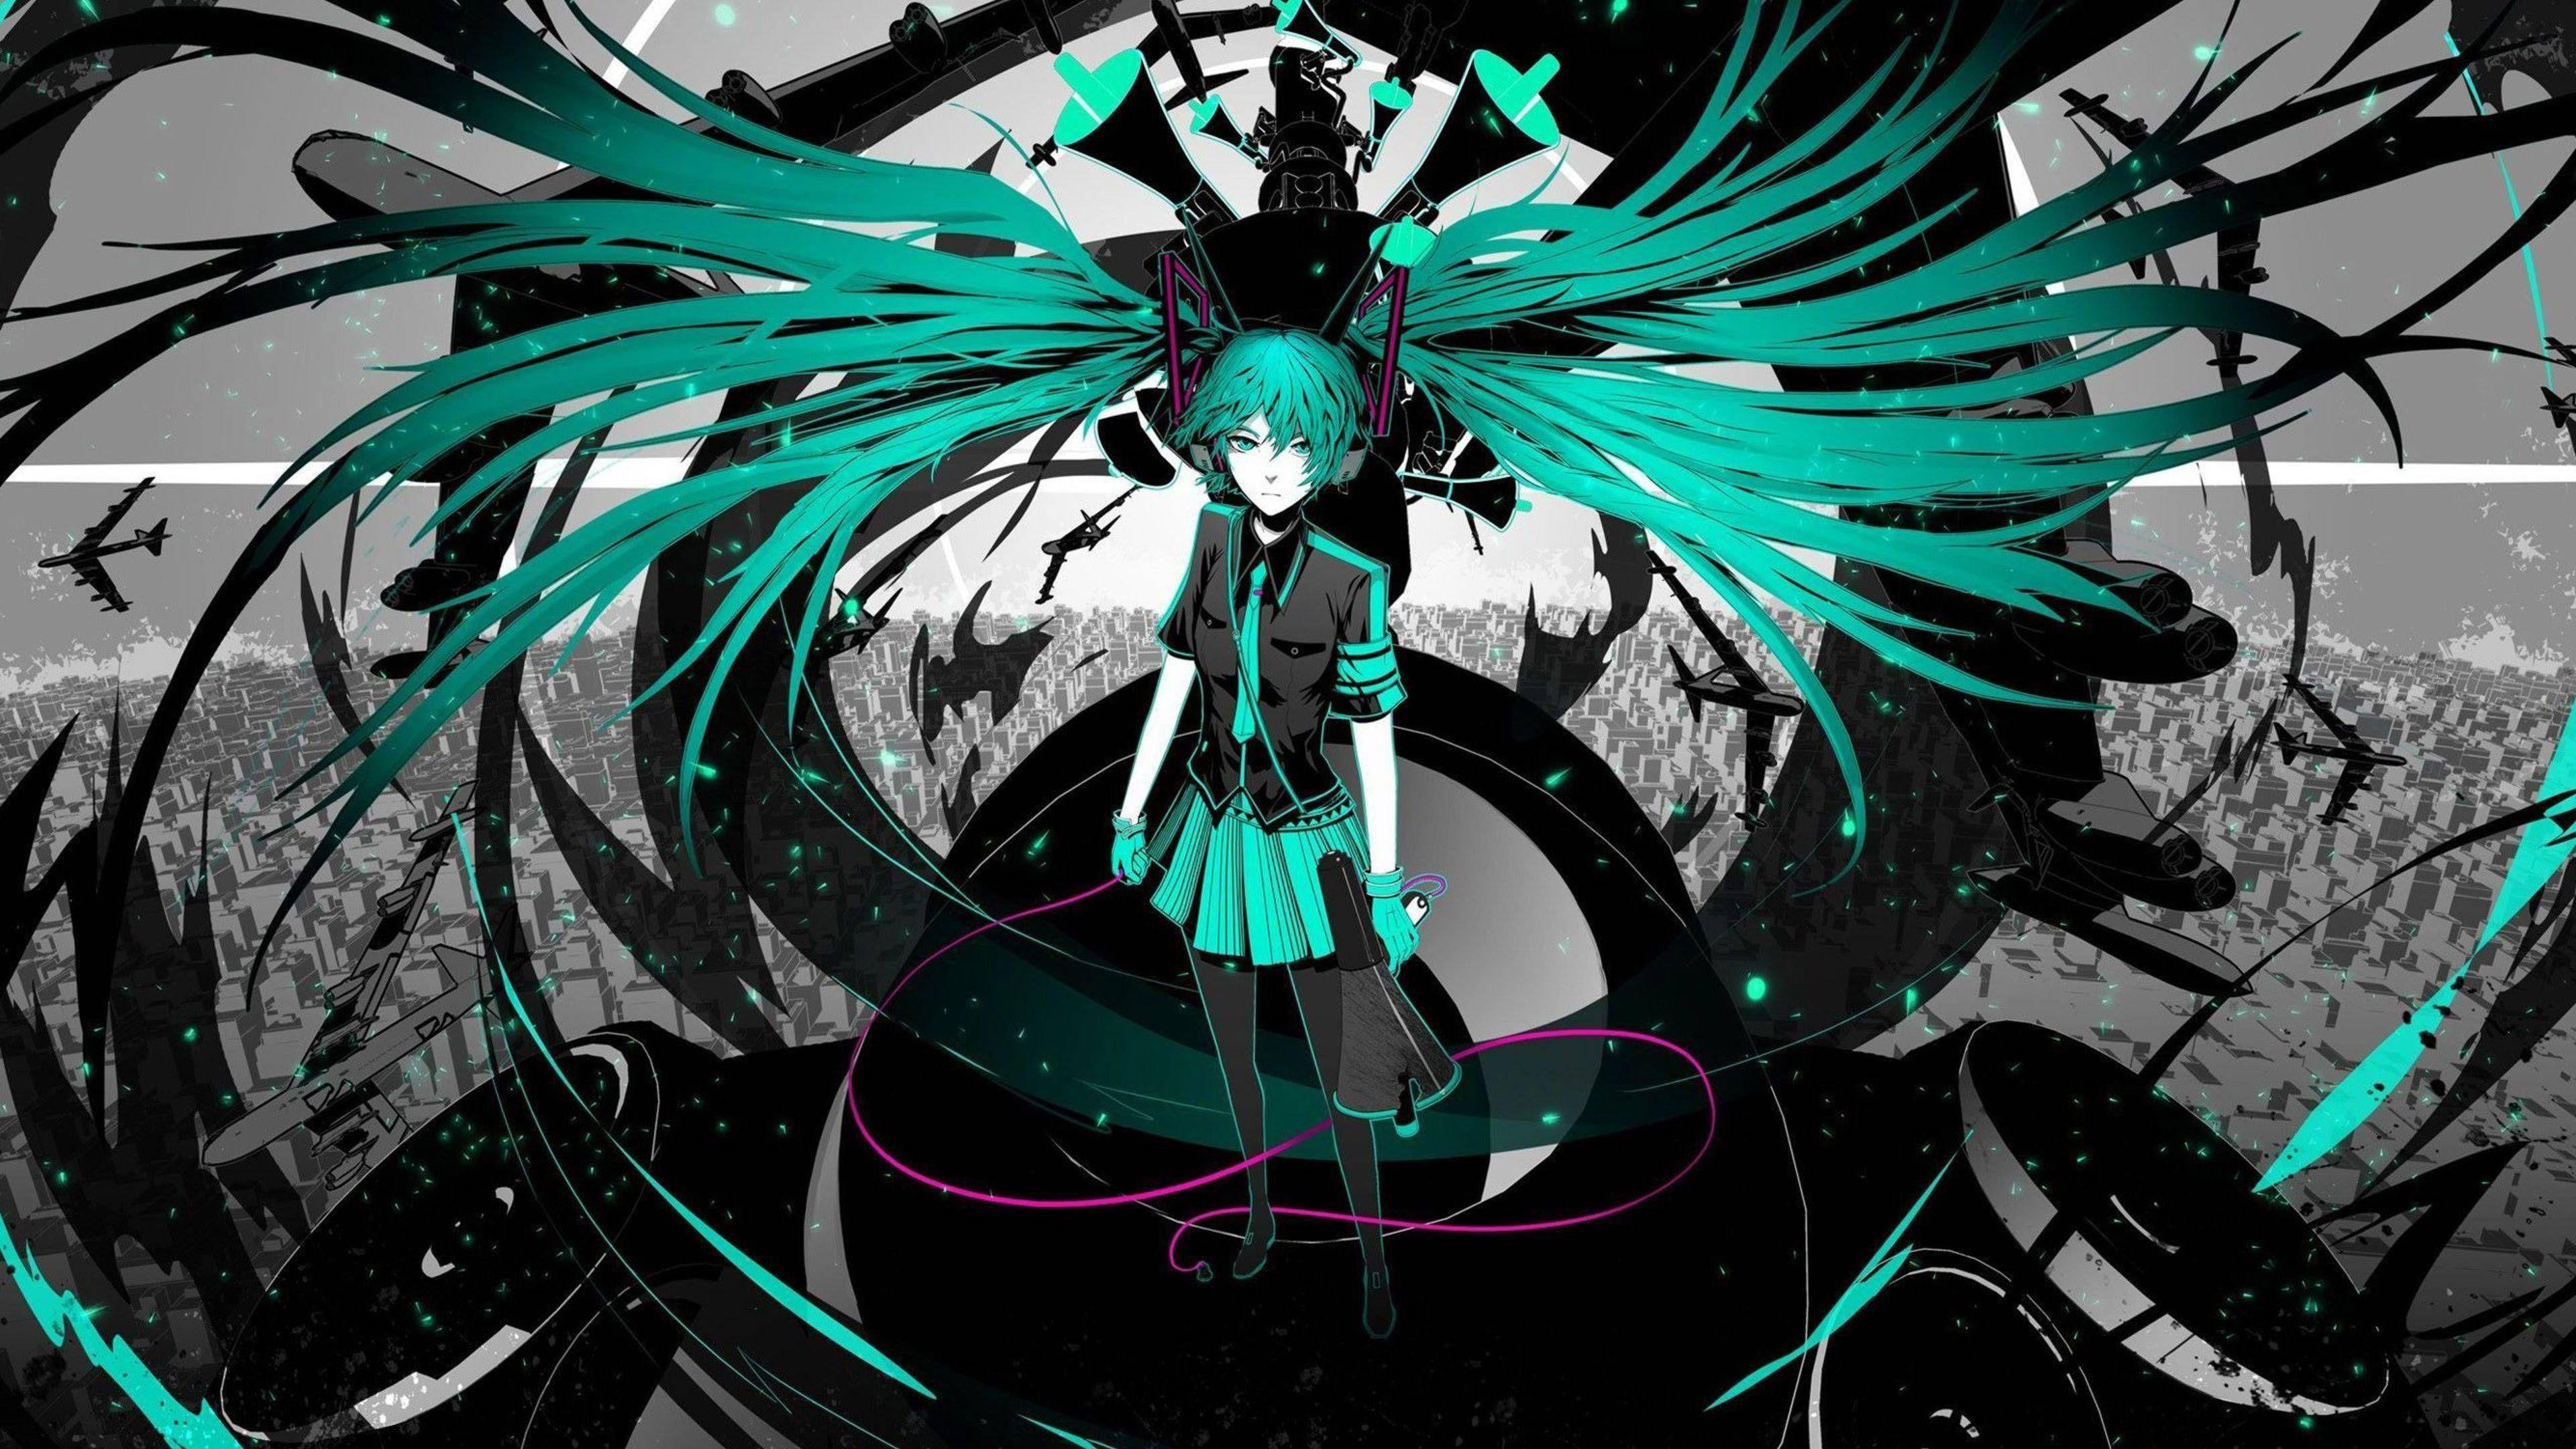 Hatsune Miku Vocaloid Long Hair Wallpaper Wide Or Hd Anime